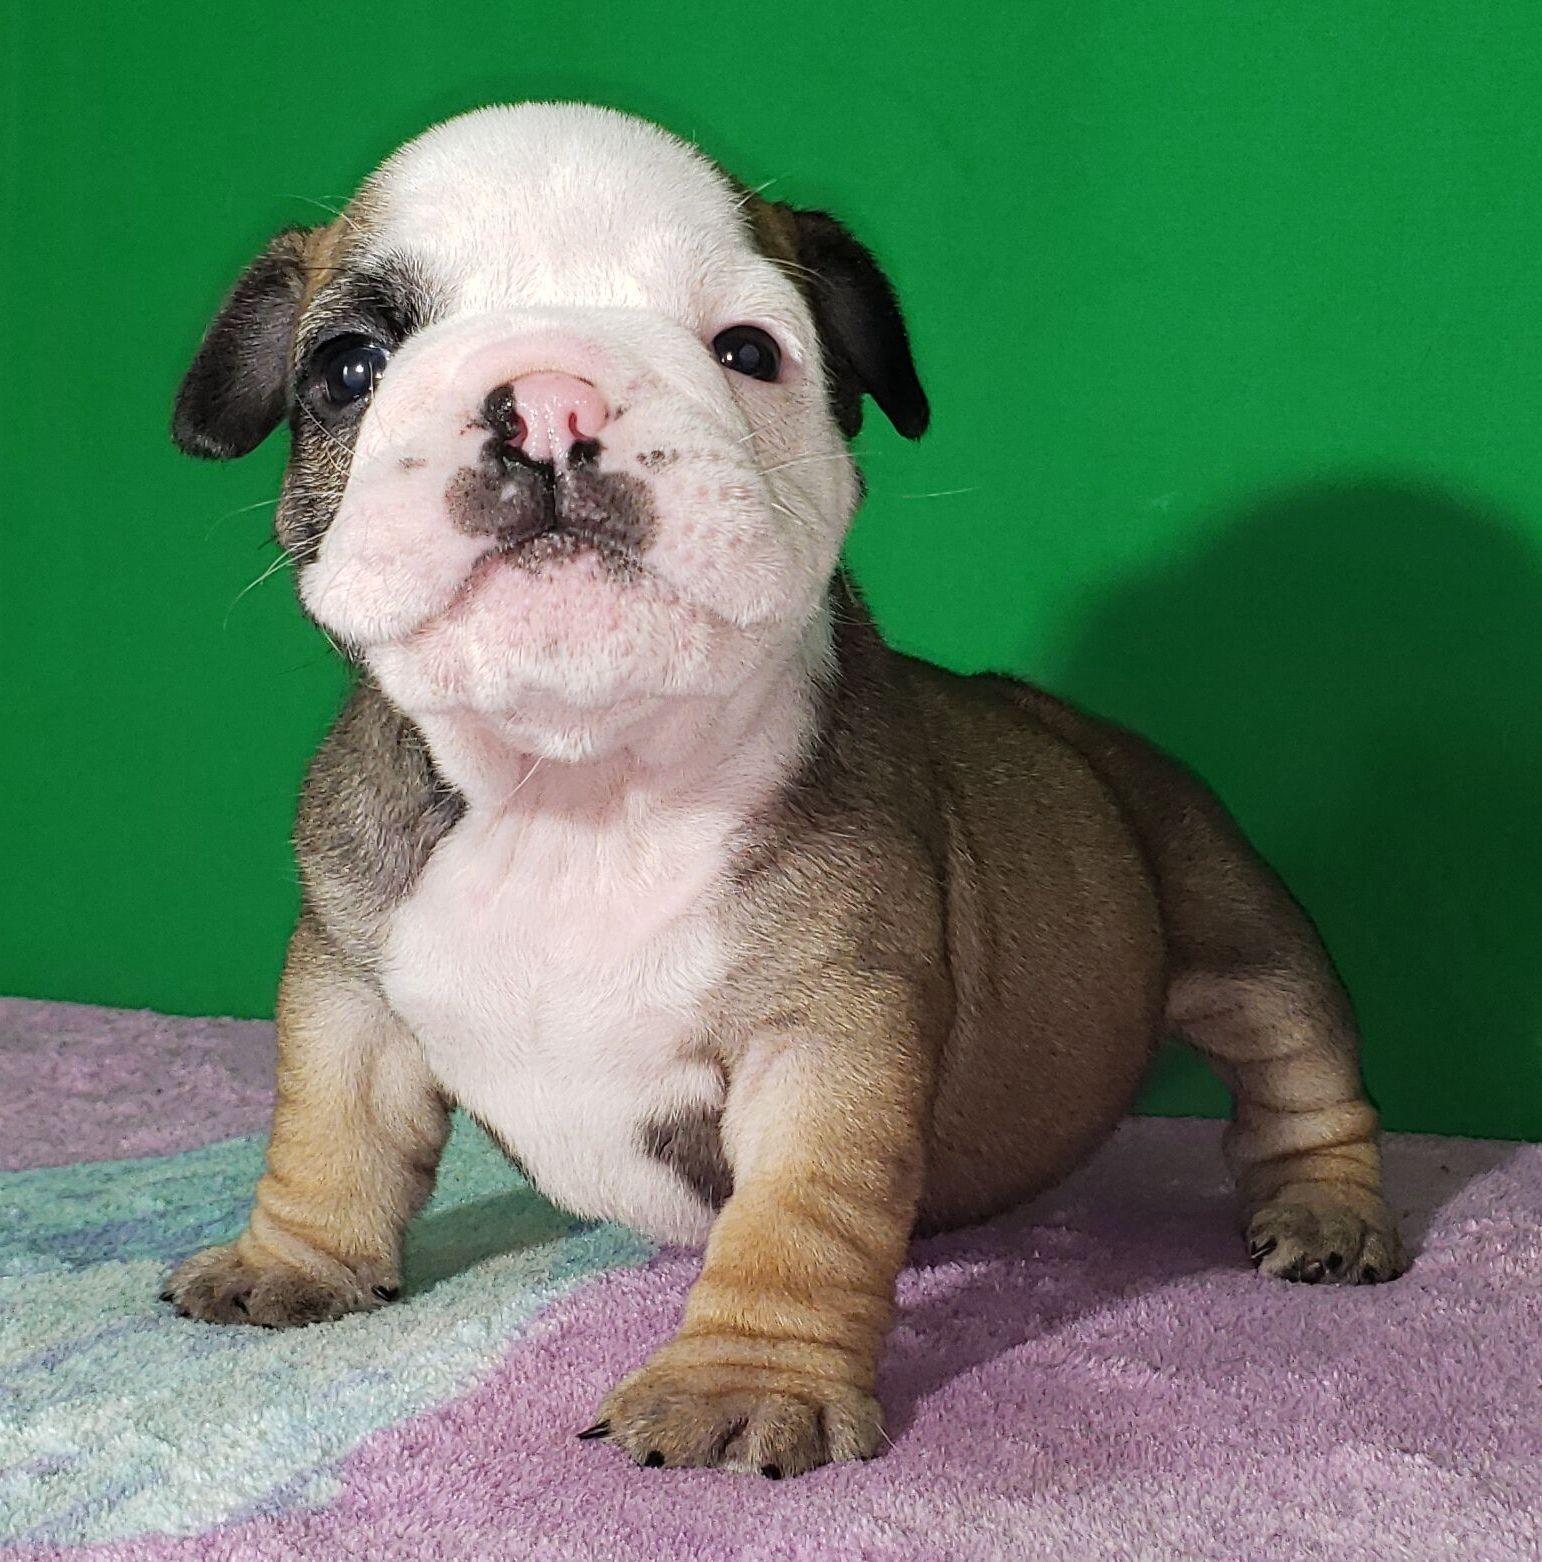 Bubba is a fawn sable English Bulldog puppy, American born